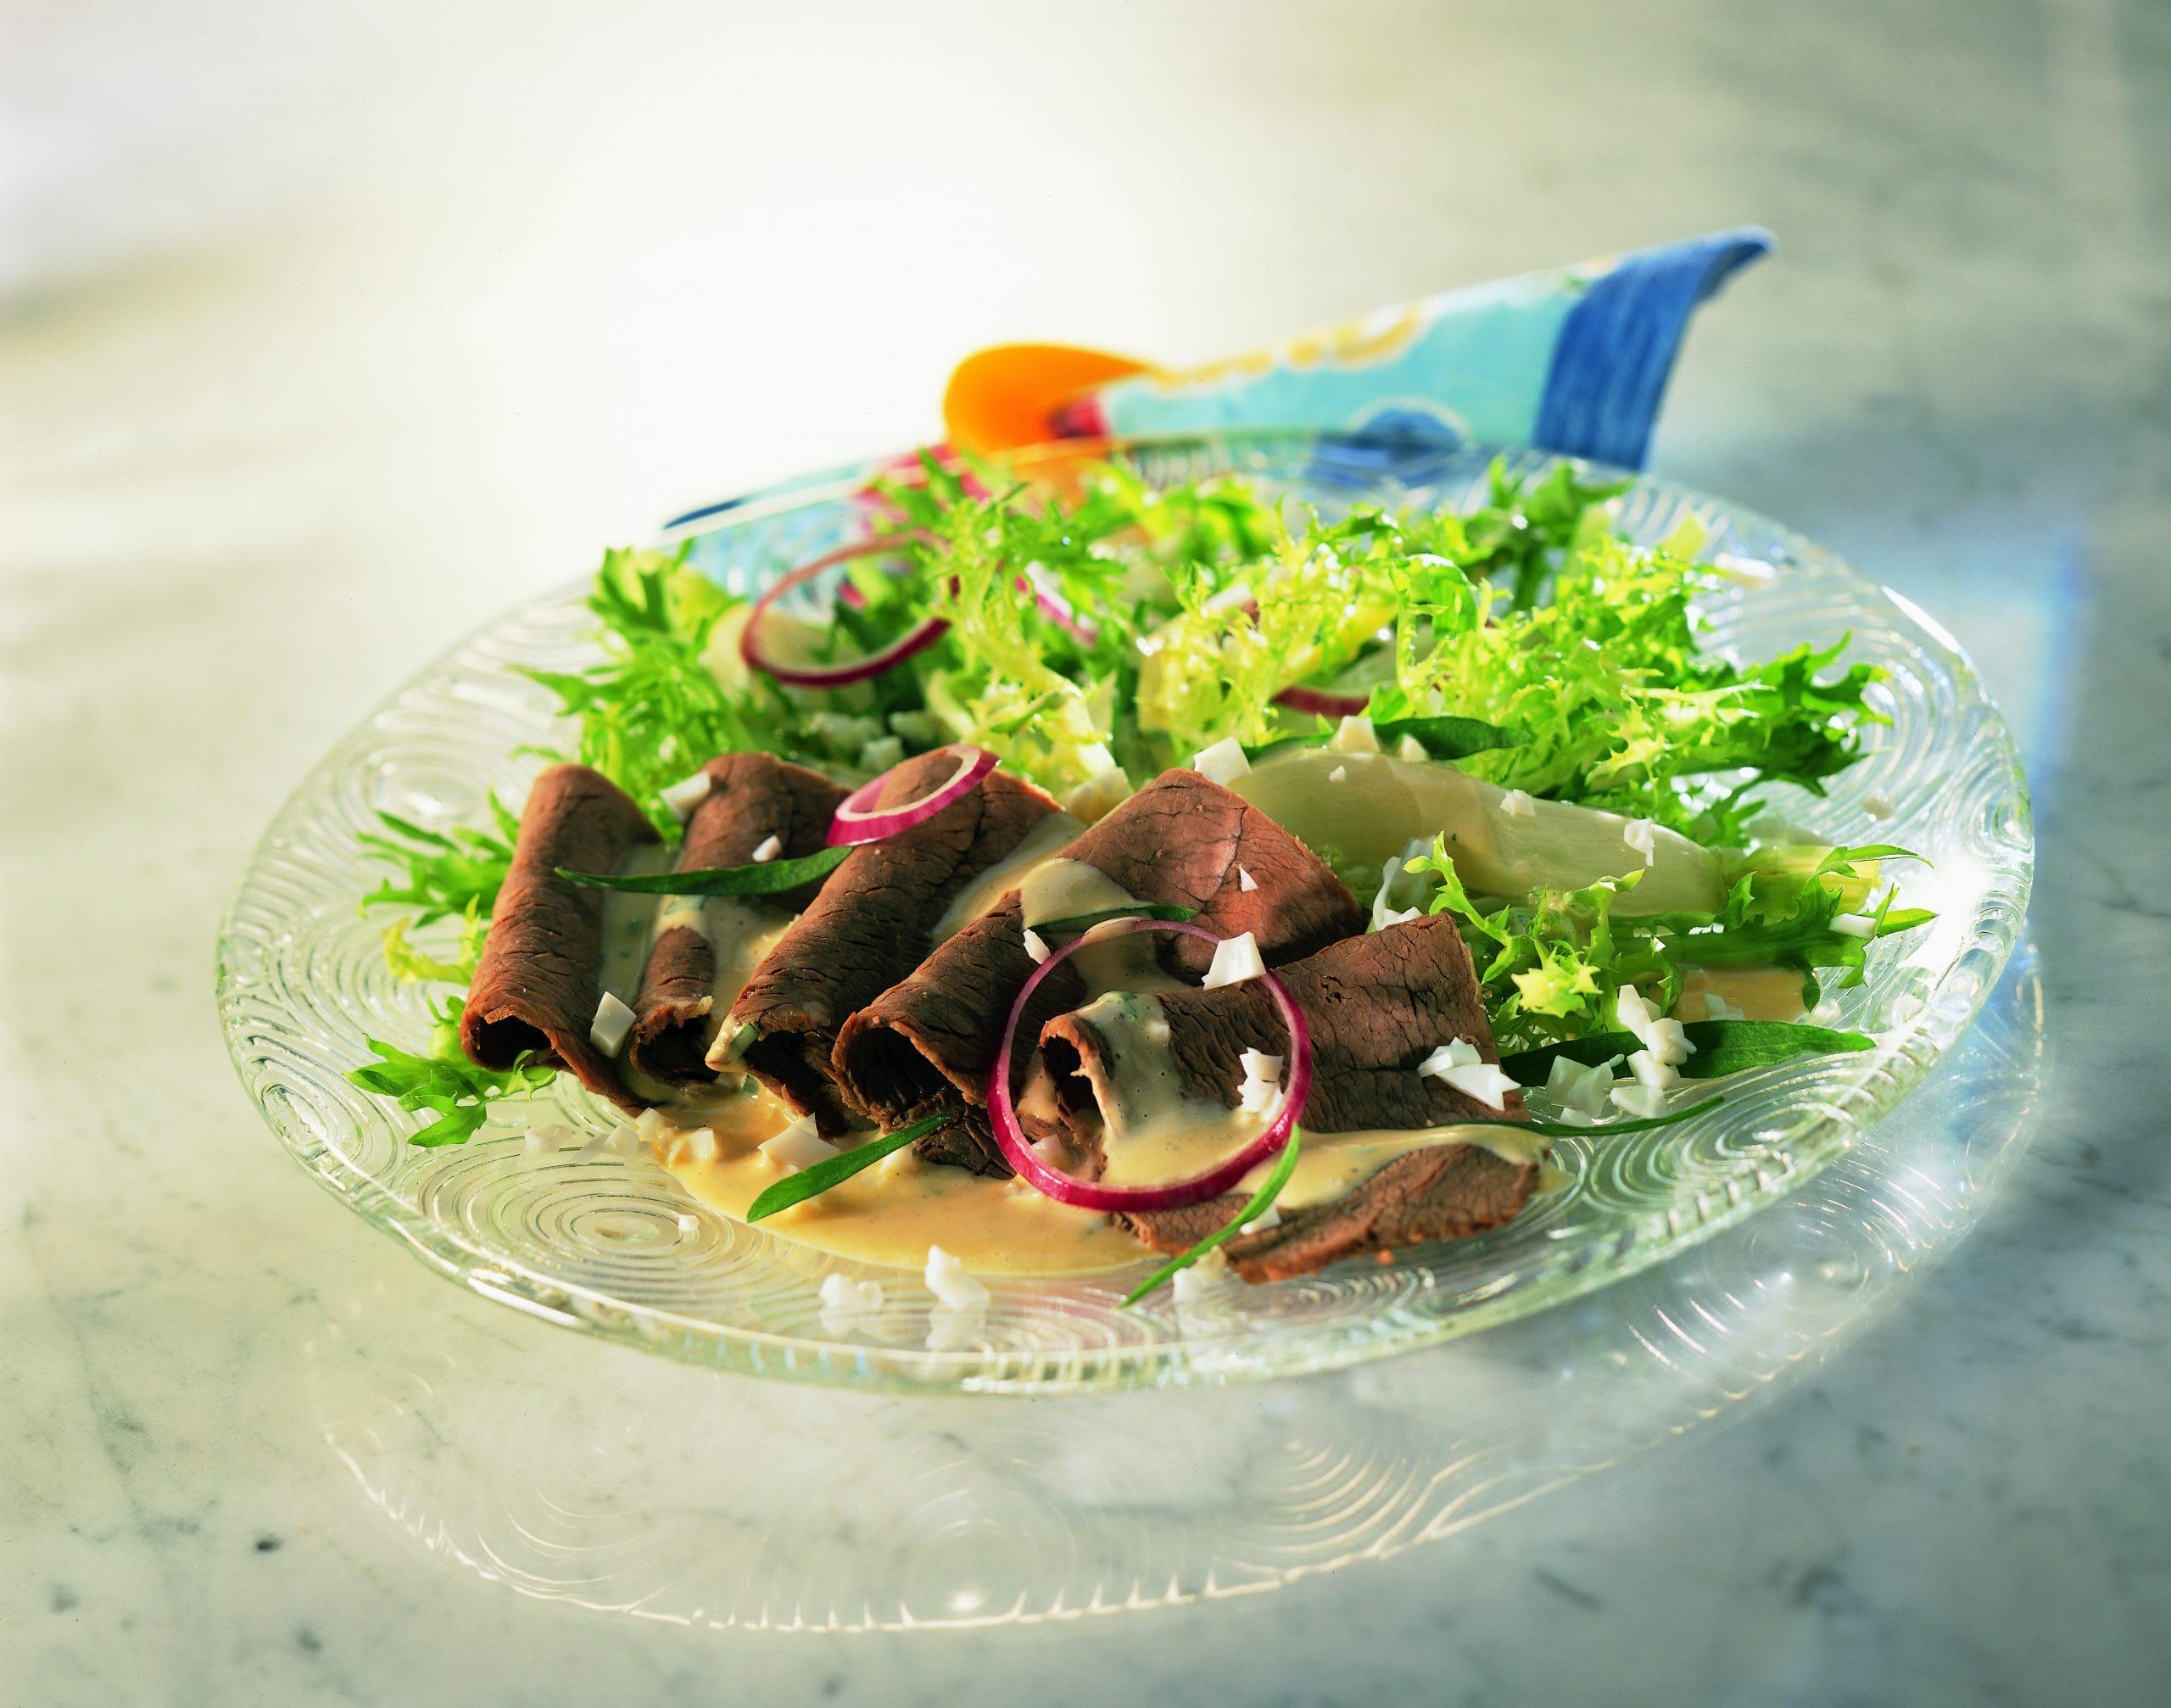 Salade de boeuf bouilli garnie de radis à l'estragon